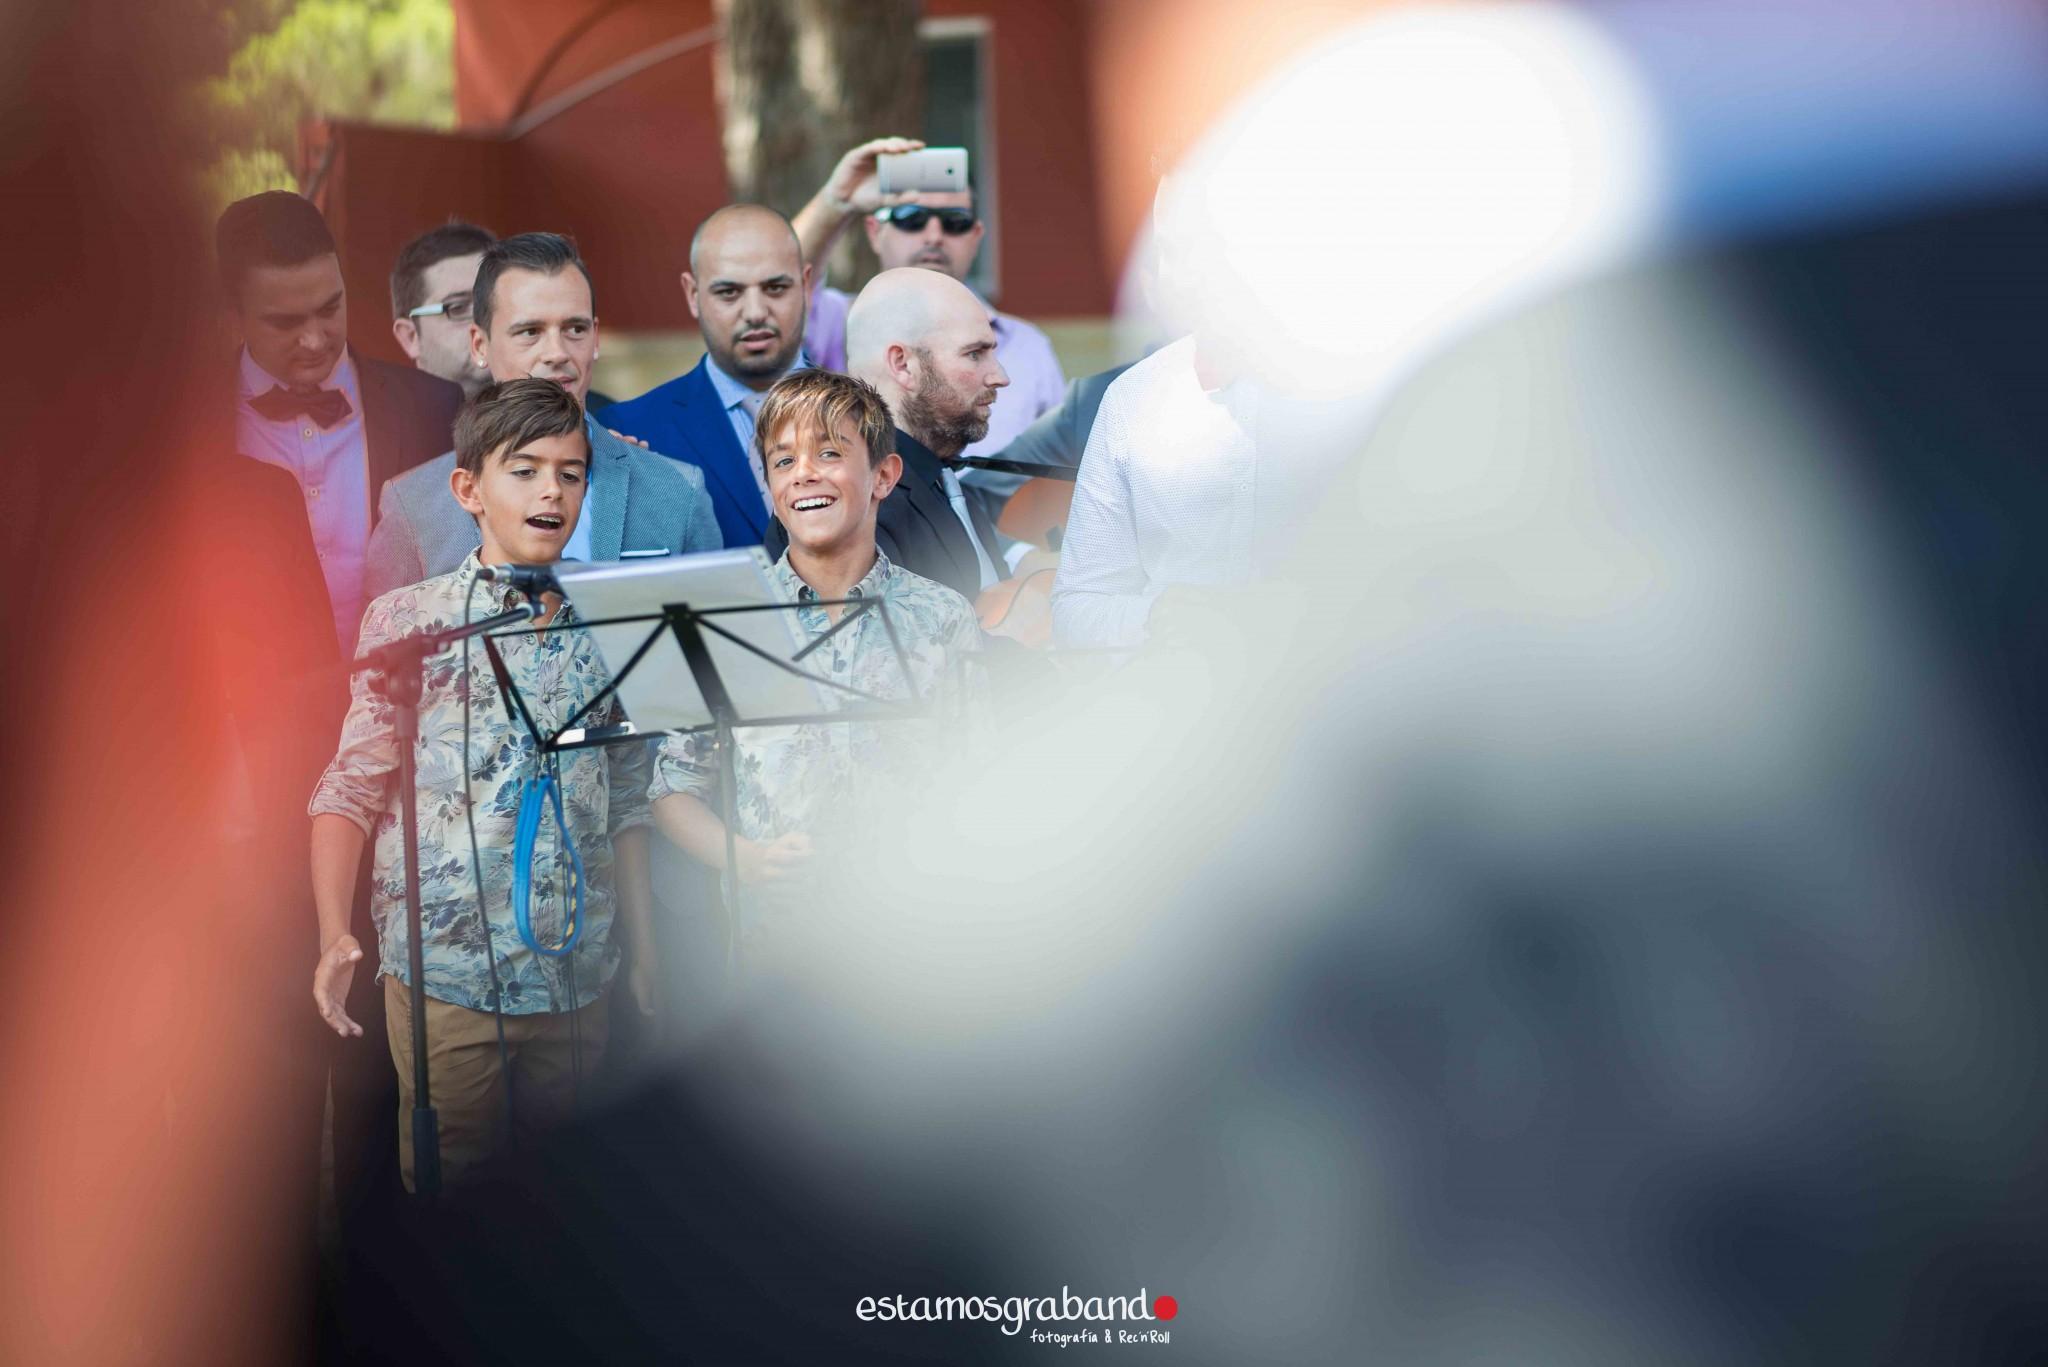 pili-y-jose_fotograficc81a-cadiz-44 Pili & Jose - video boda cadiz